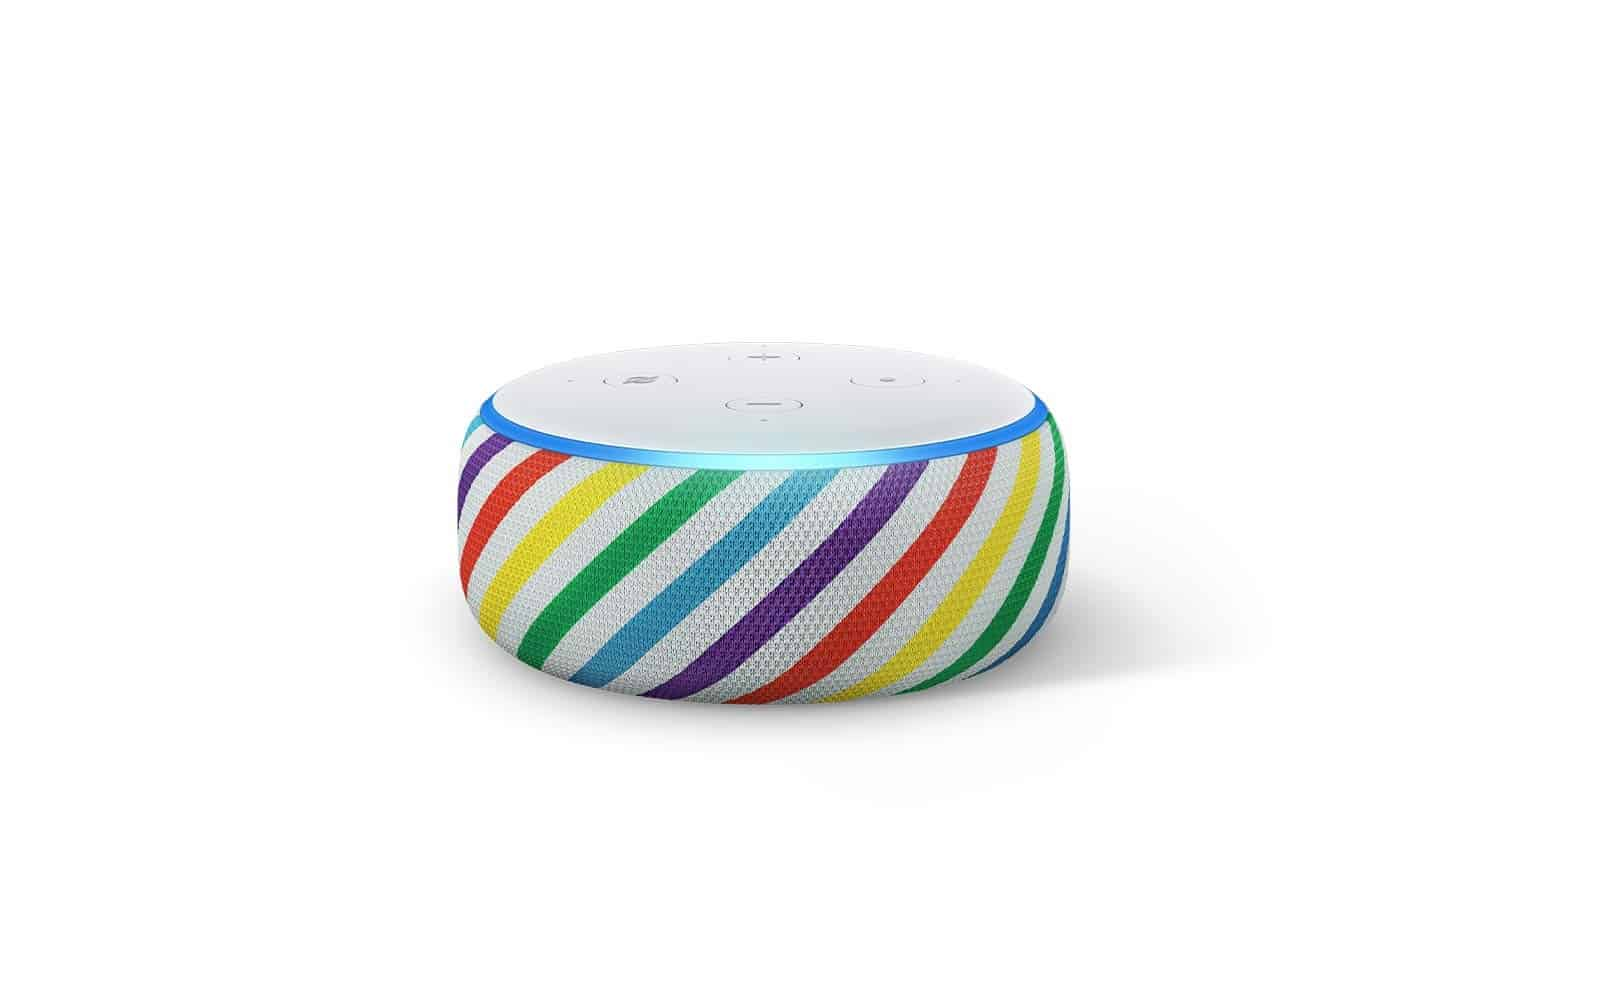 Amazon Echo Dot Kids Edition 2019 Rainbow